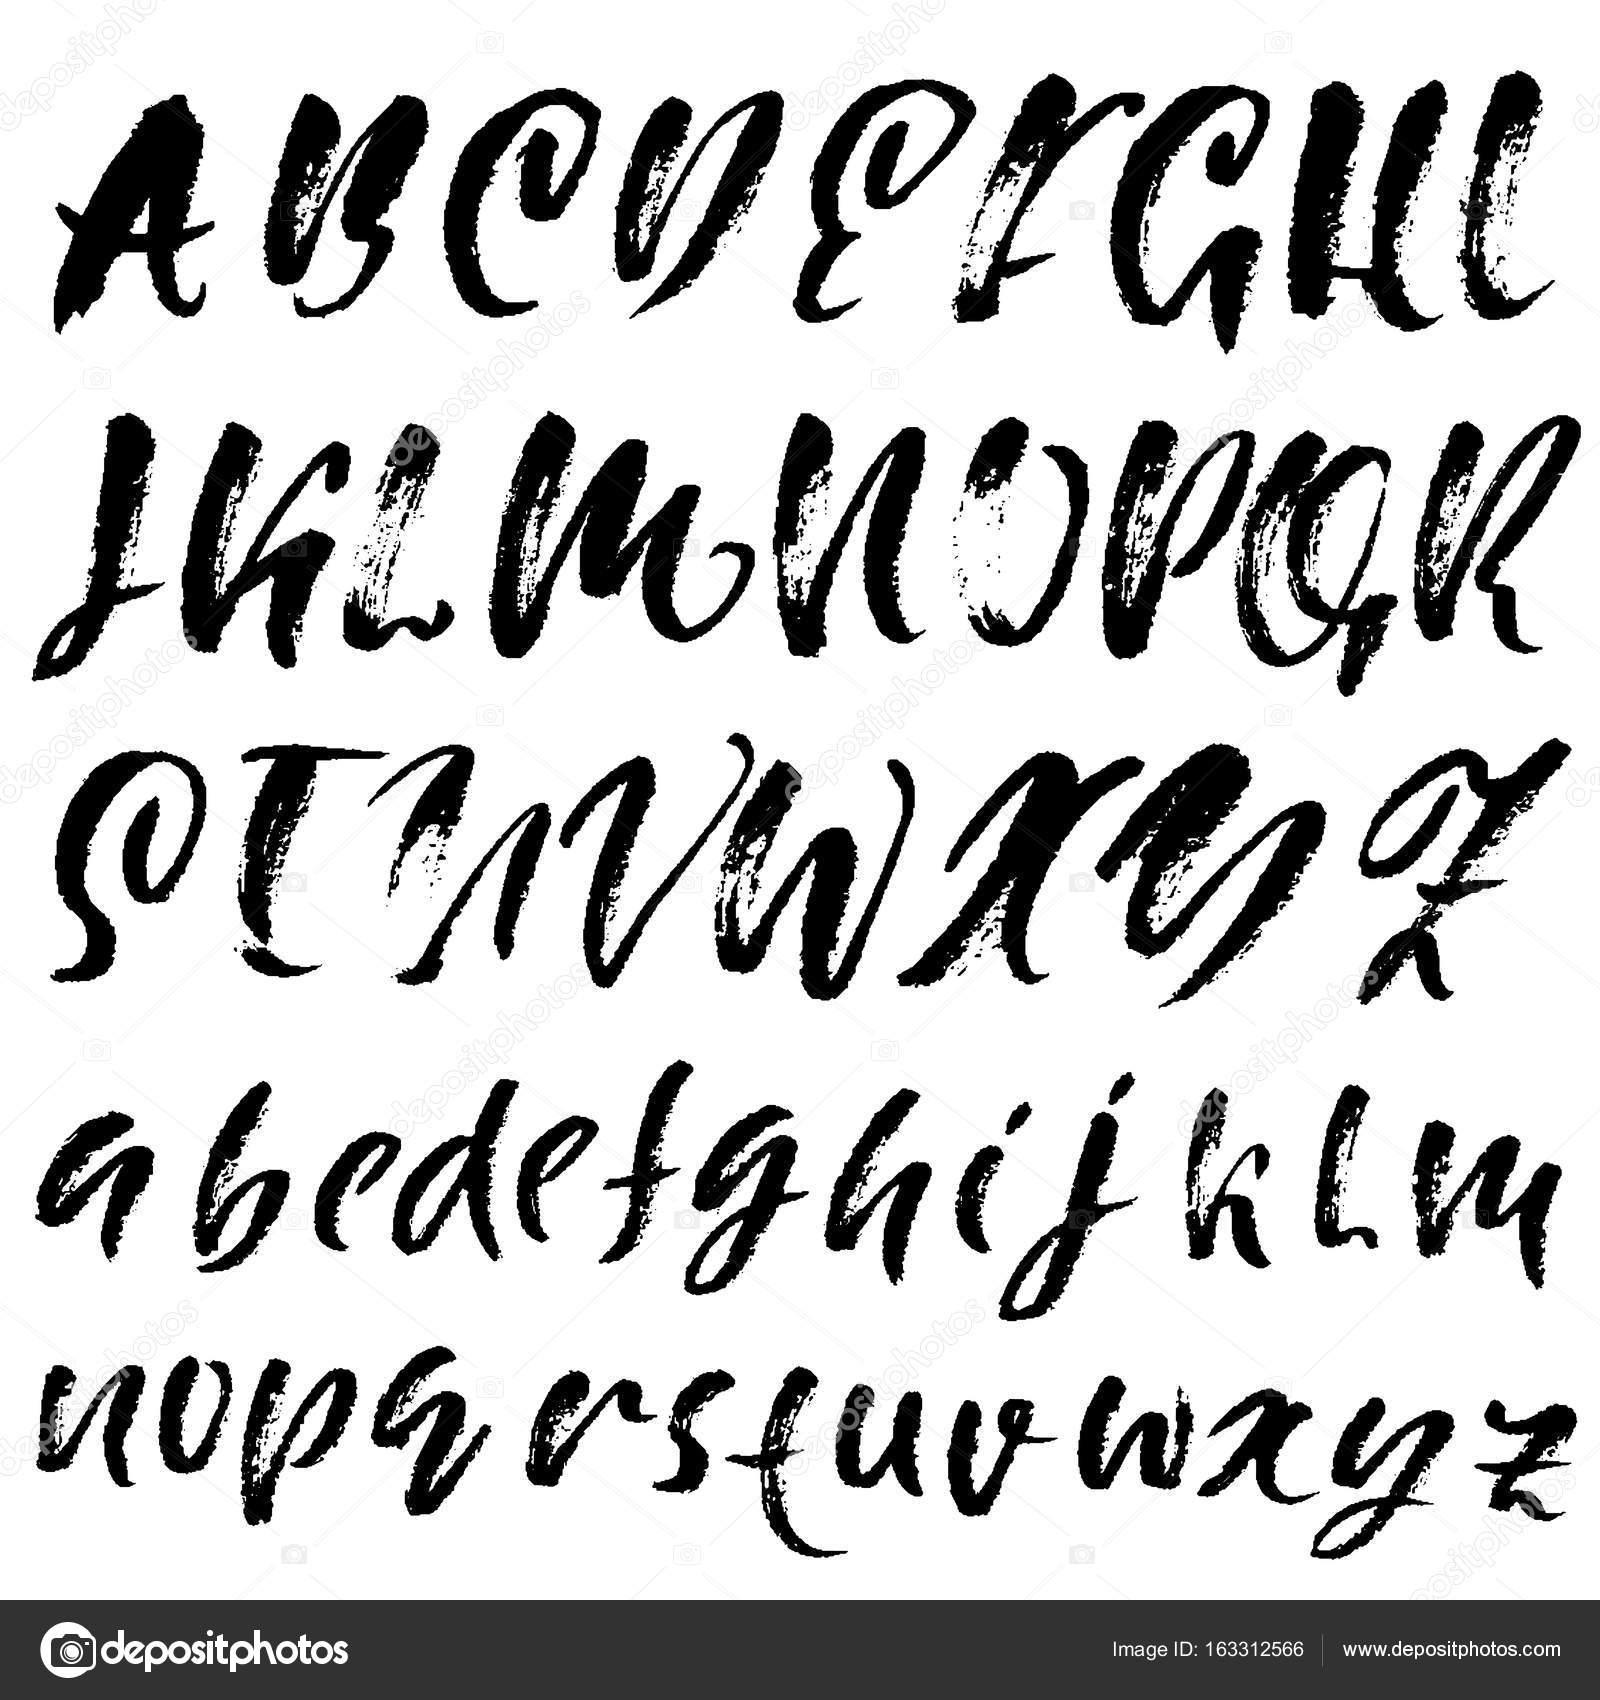 Polices De Calligraphie Elegante Dessine Main Lettrage De Pinceau